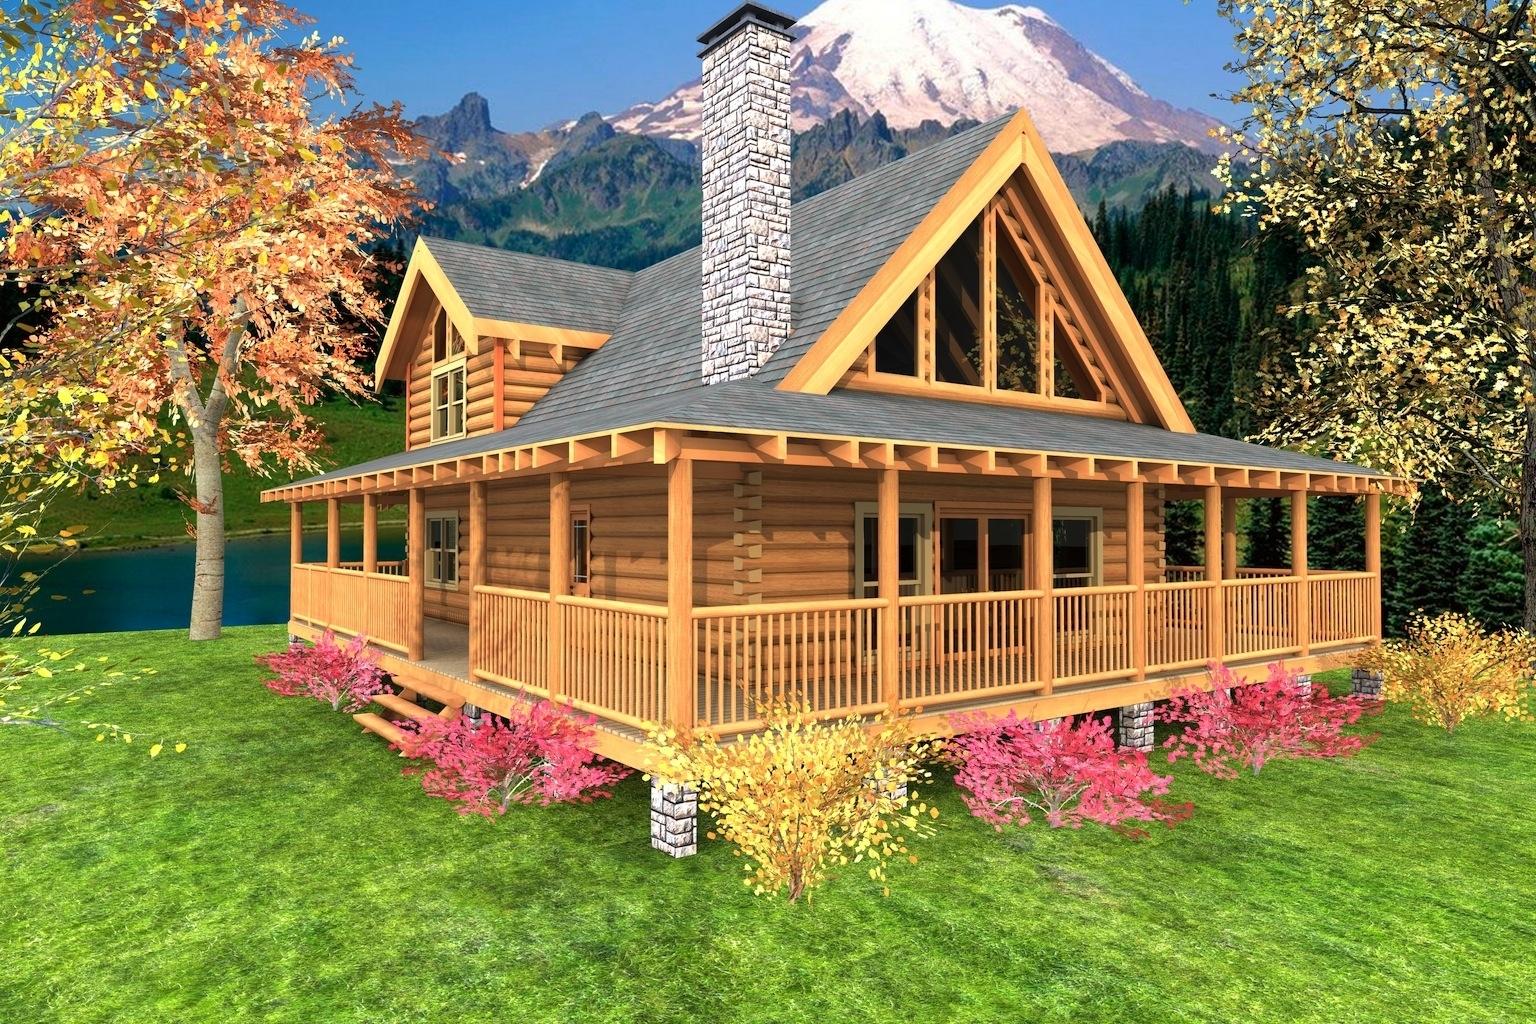 Distinctive Log Cabin With Wrap Around Porch — Randolph Indoor and Outdoor  Design